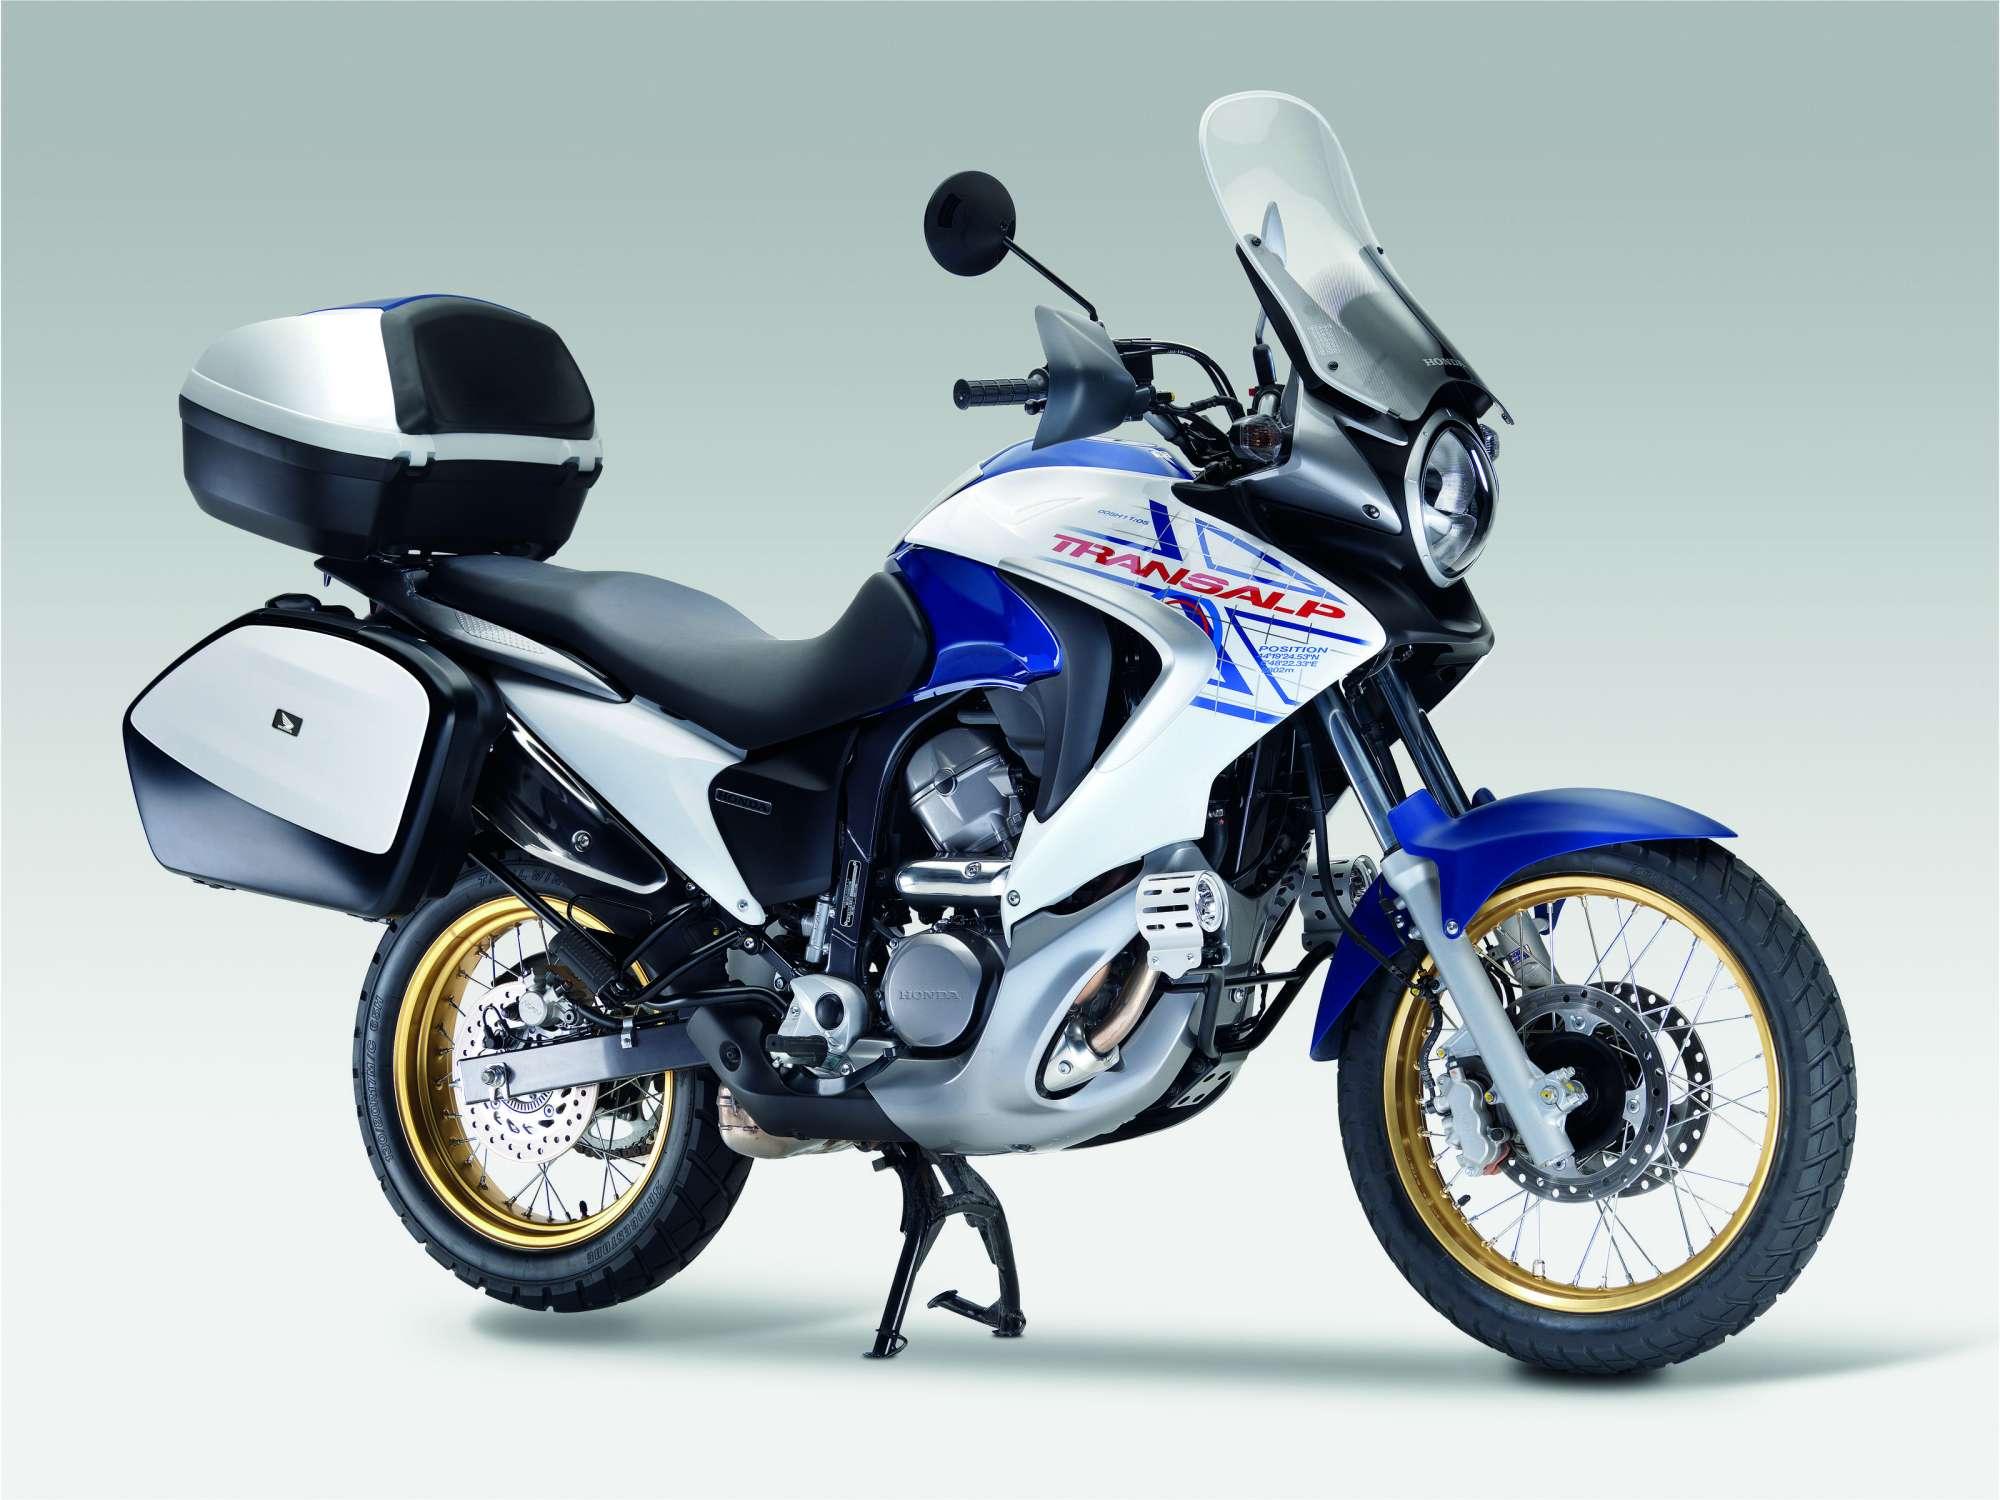 Honda XL 700V Transalp Bilder und technische Daten